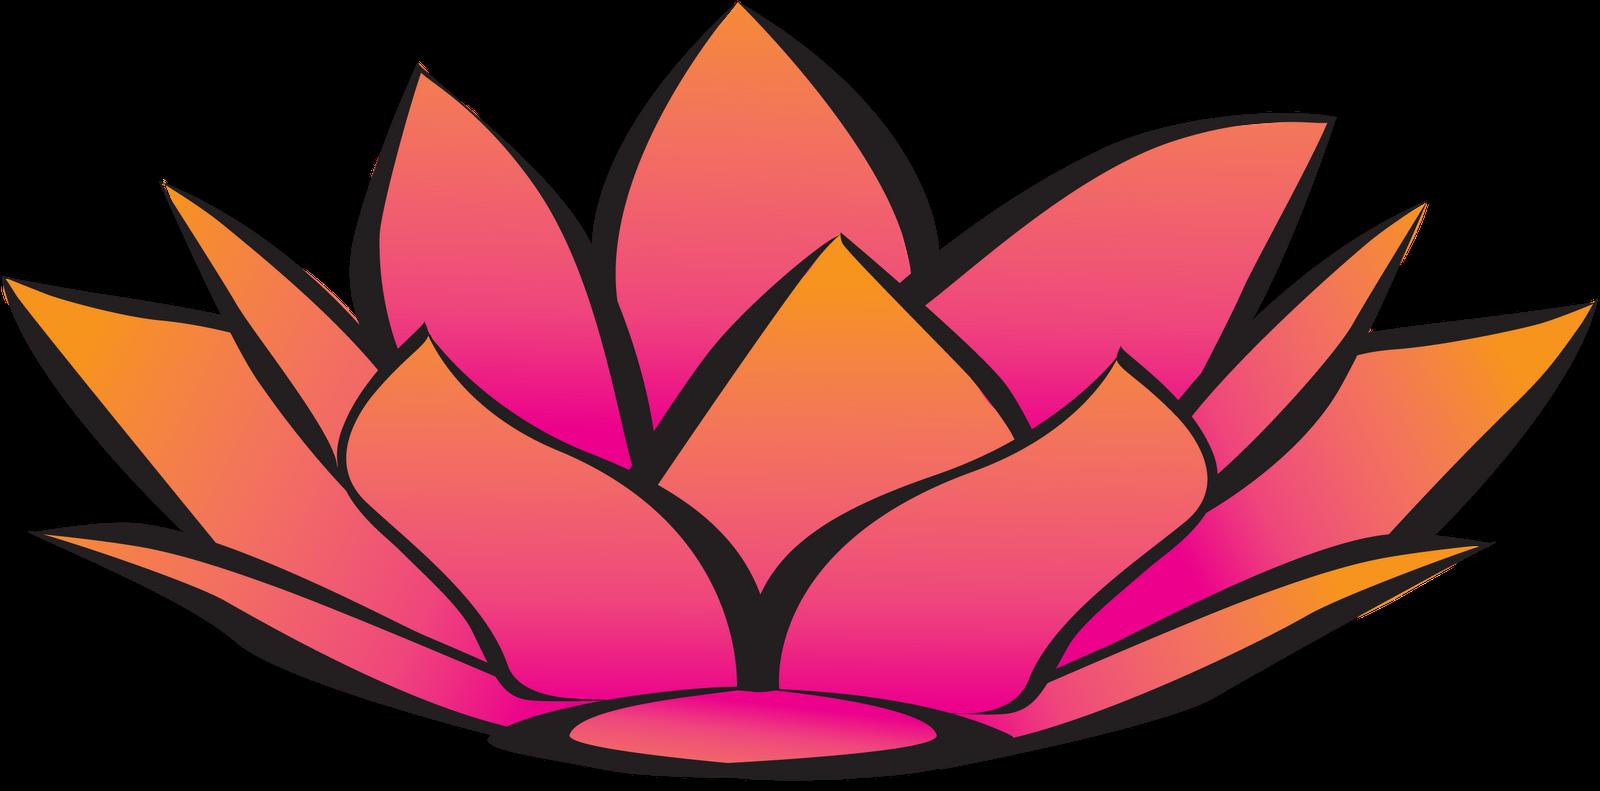 Lotus flower graphic